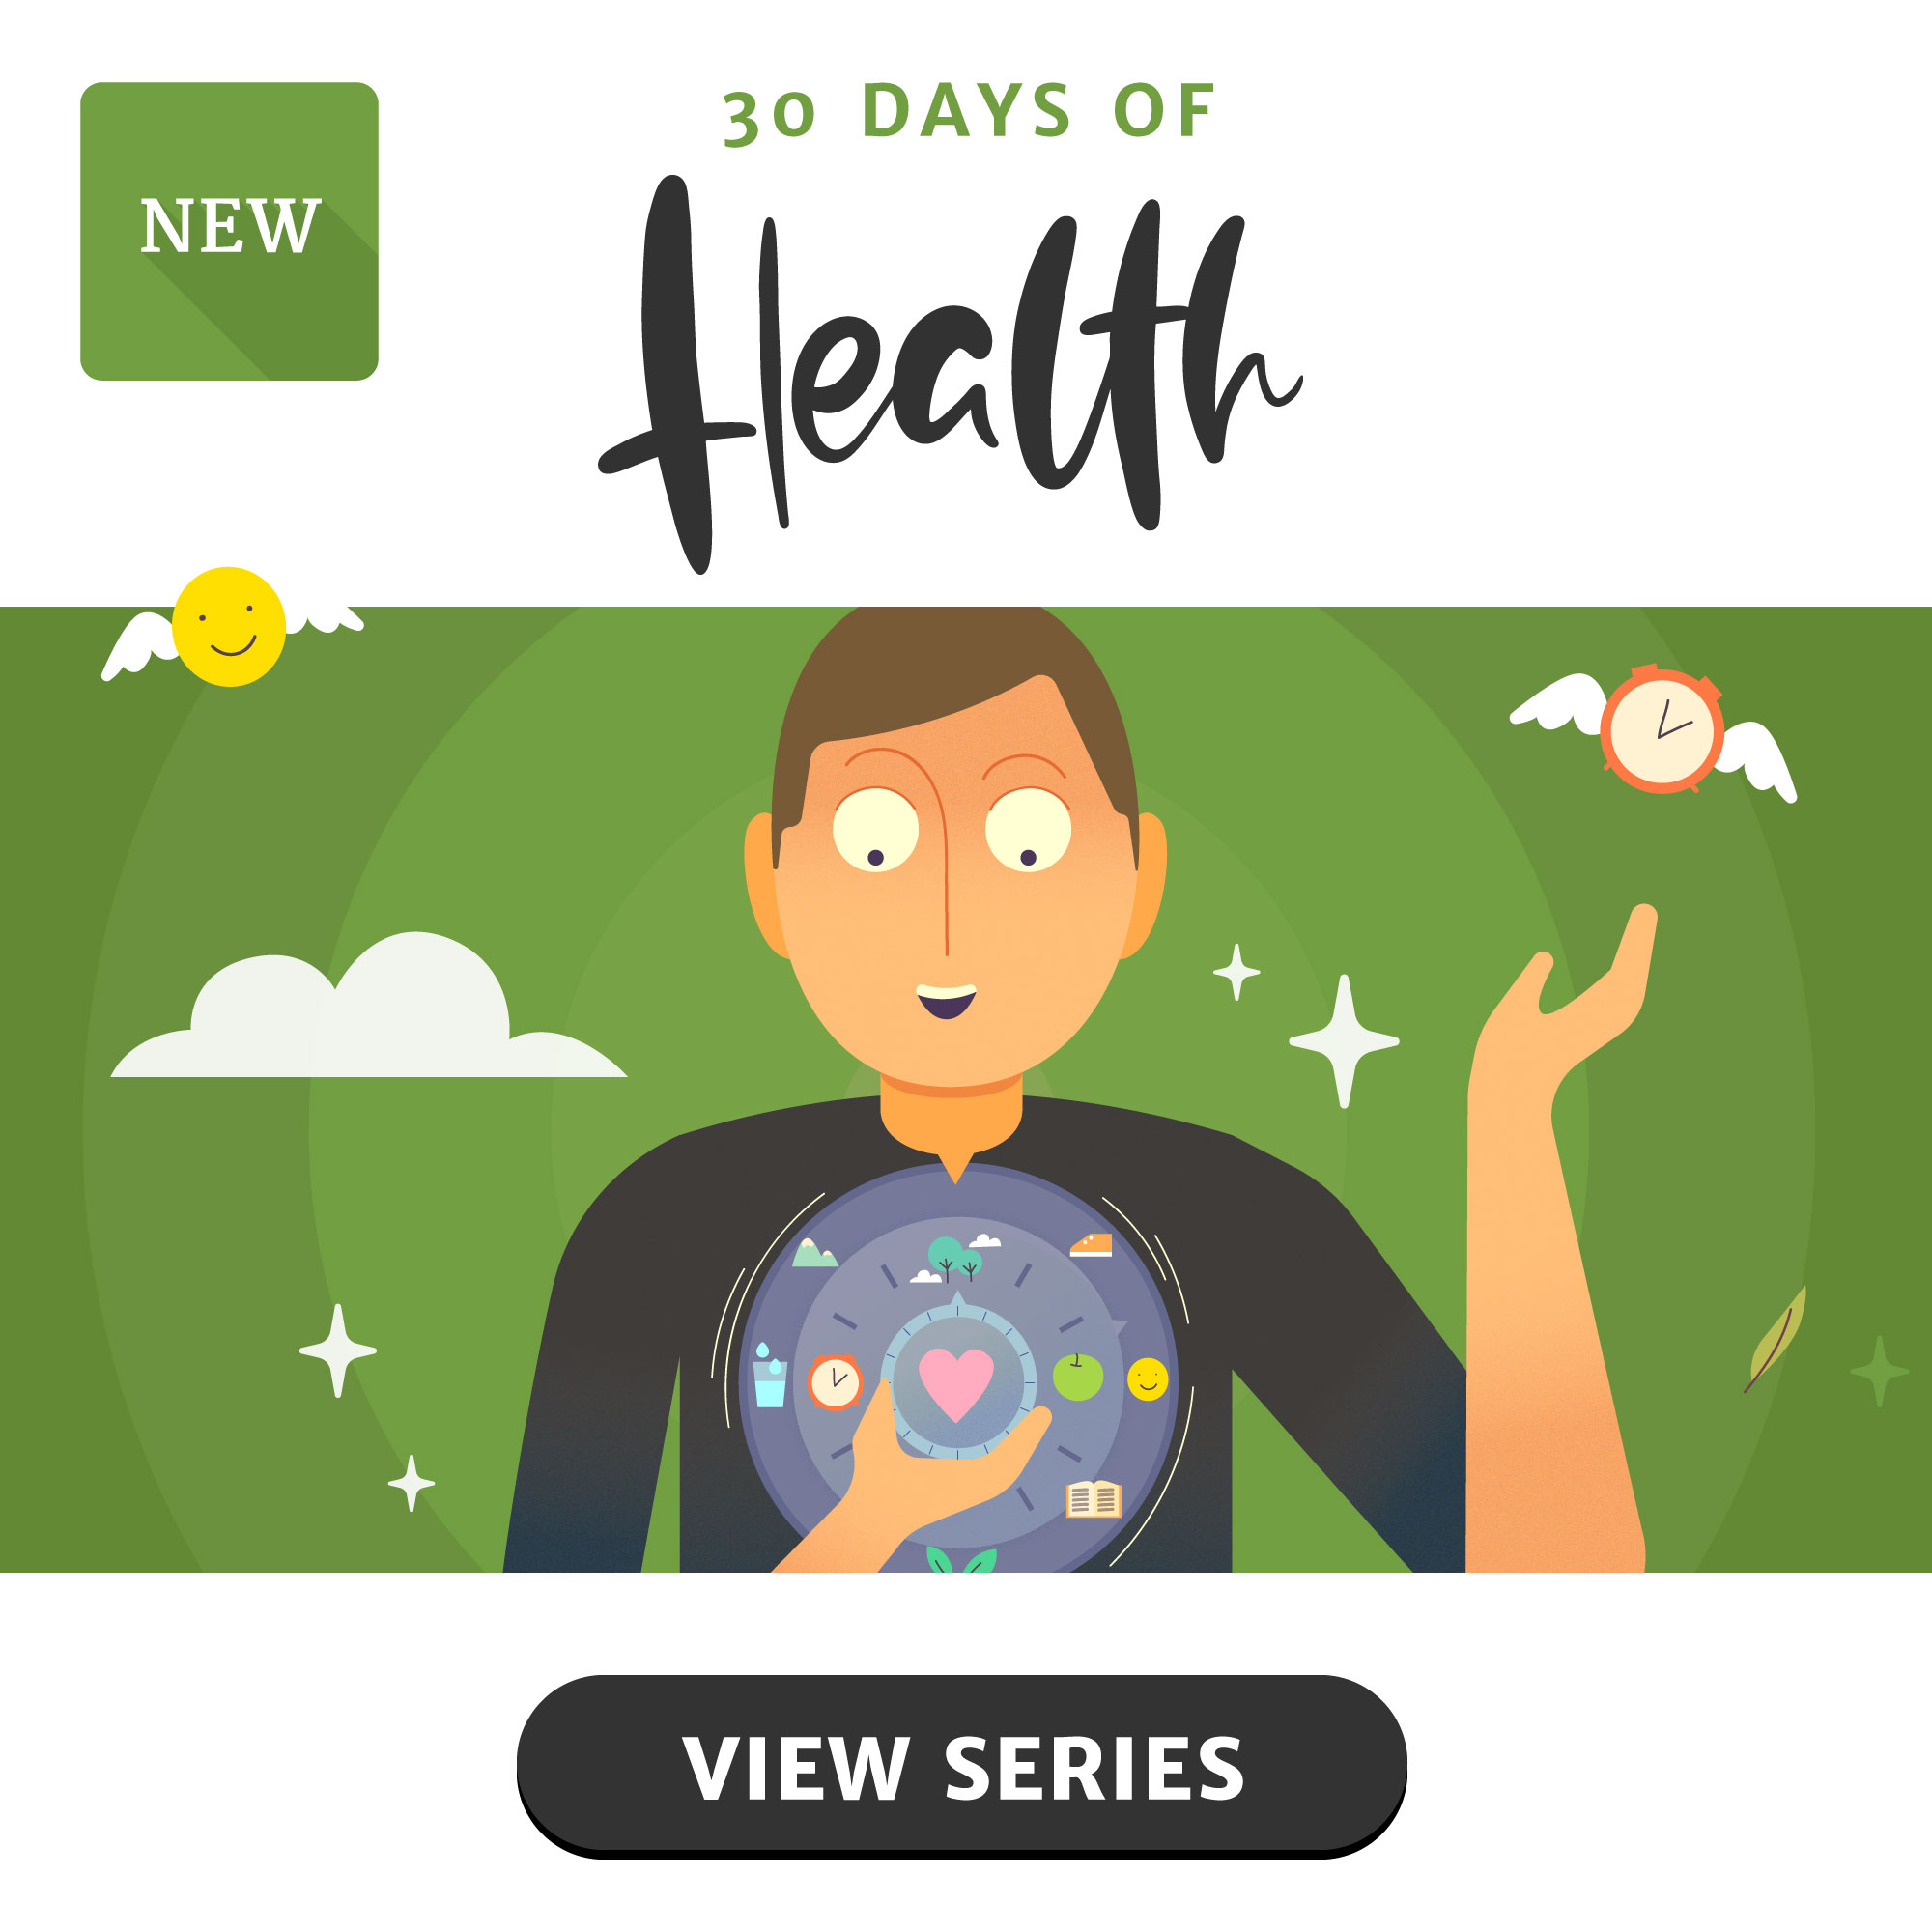 30 Days of Health Series